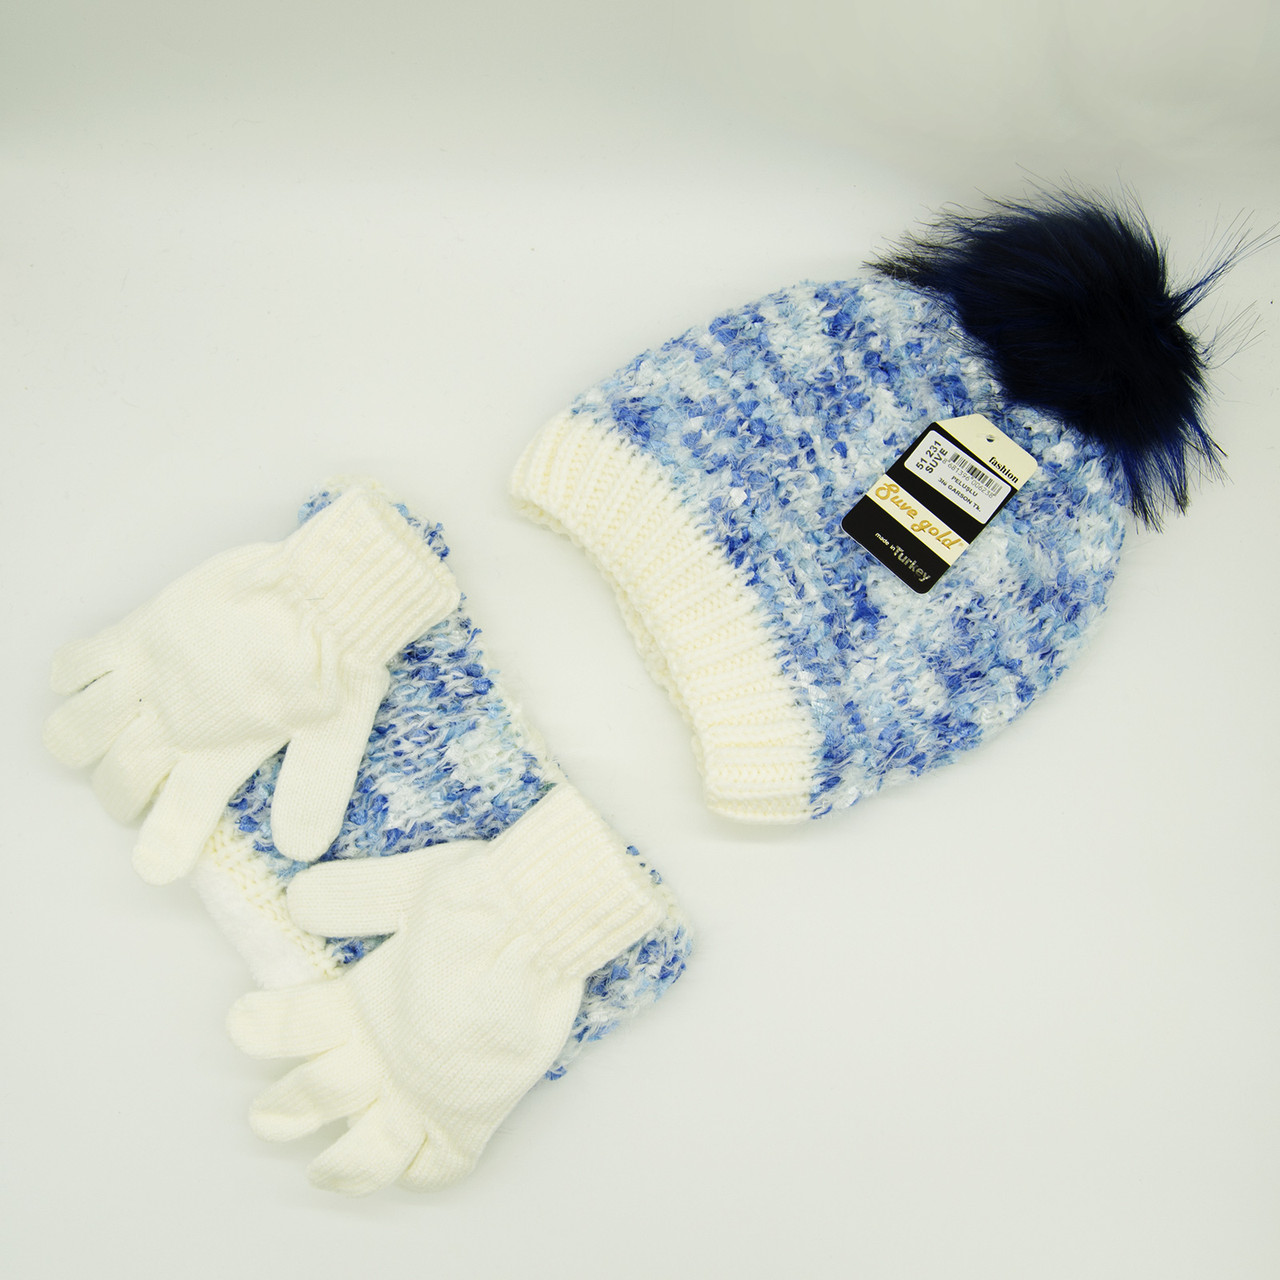 Комплект: шапка, снуд, перчатки Детский 7-12 лет Голубой